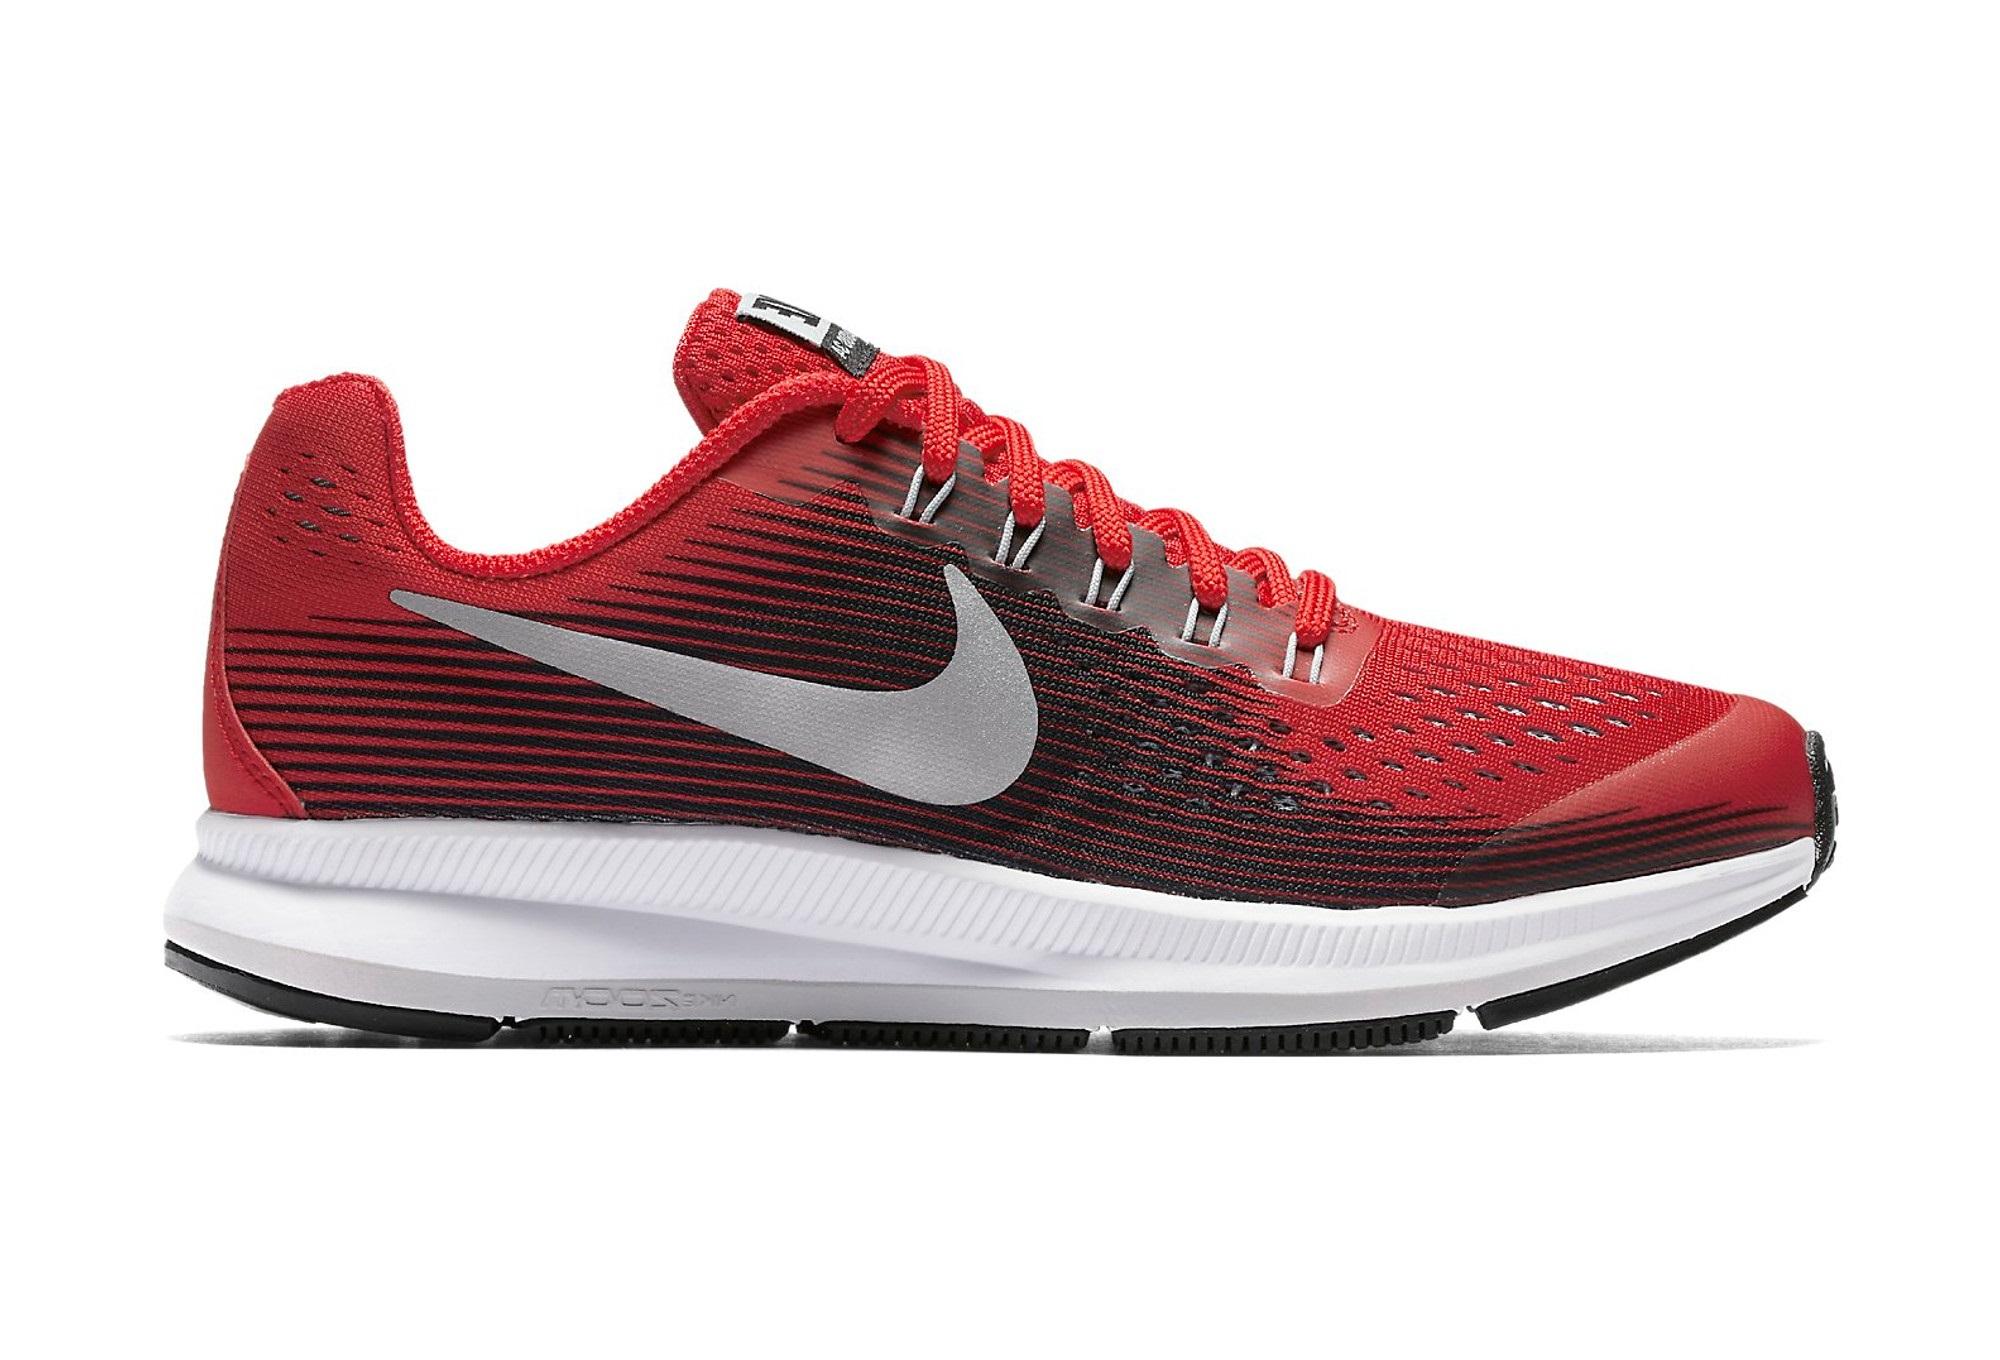 c7a1c715c Zapatillas Nike Air Zoom Pegasus 34 para Niño Niña Rojo Noir ...